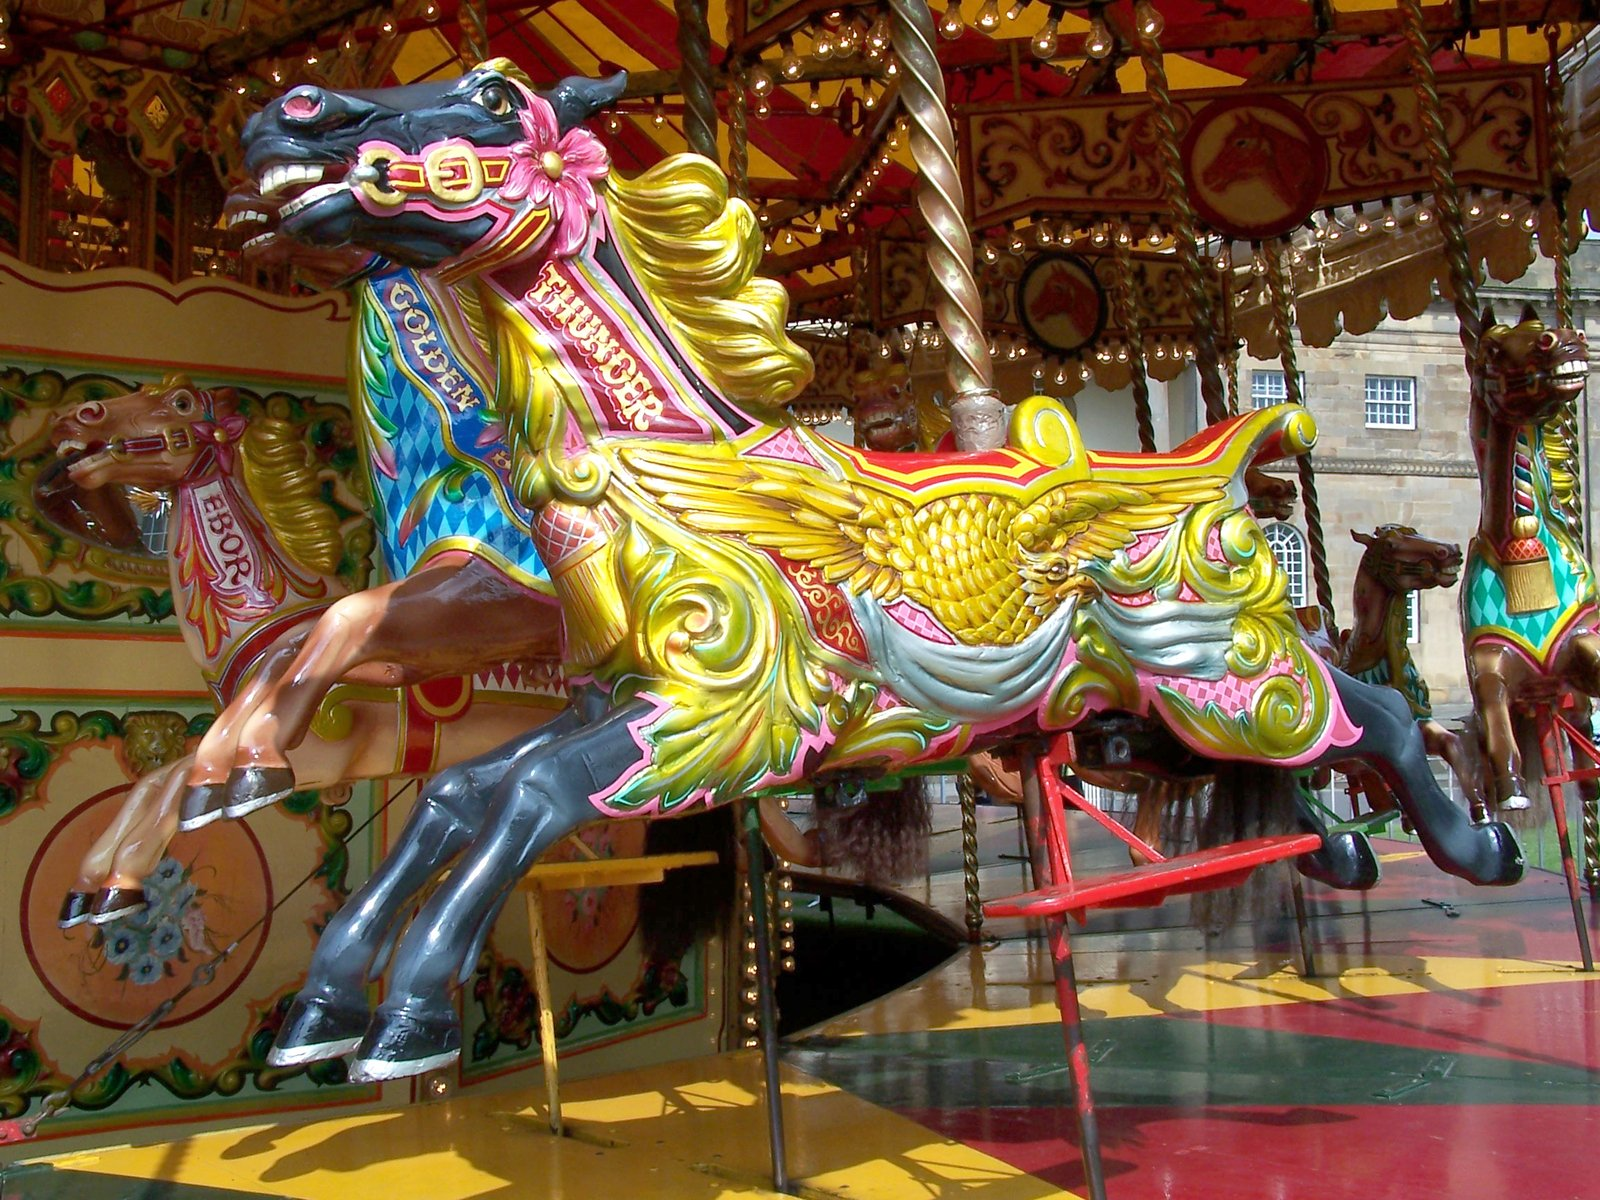 Free Carousel Horses 3 Stock Photo - FreeImages.com